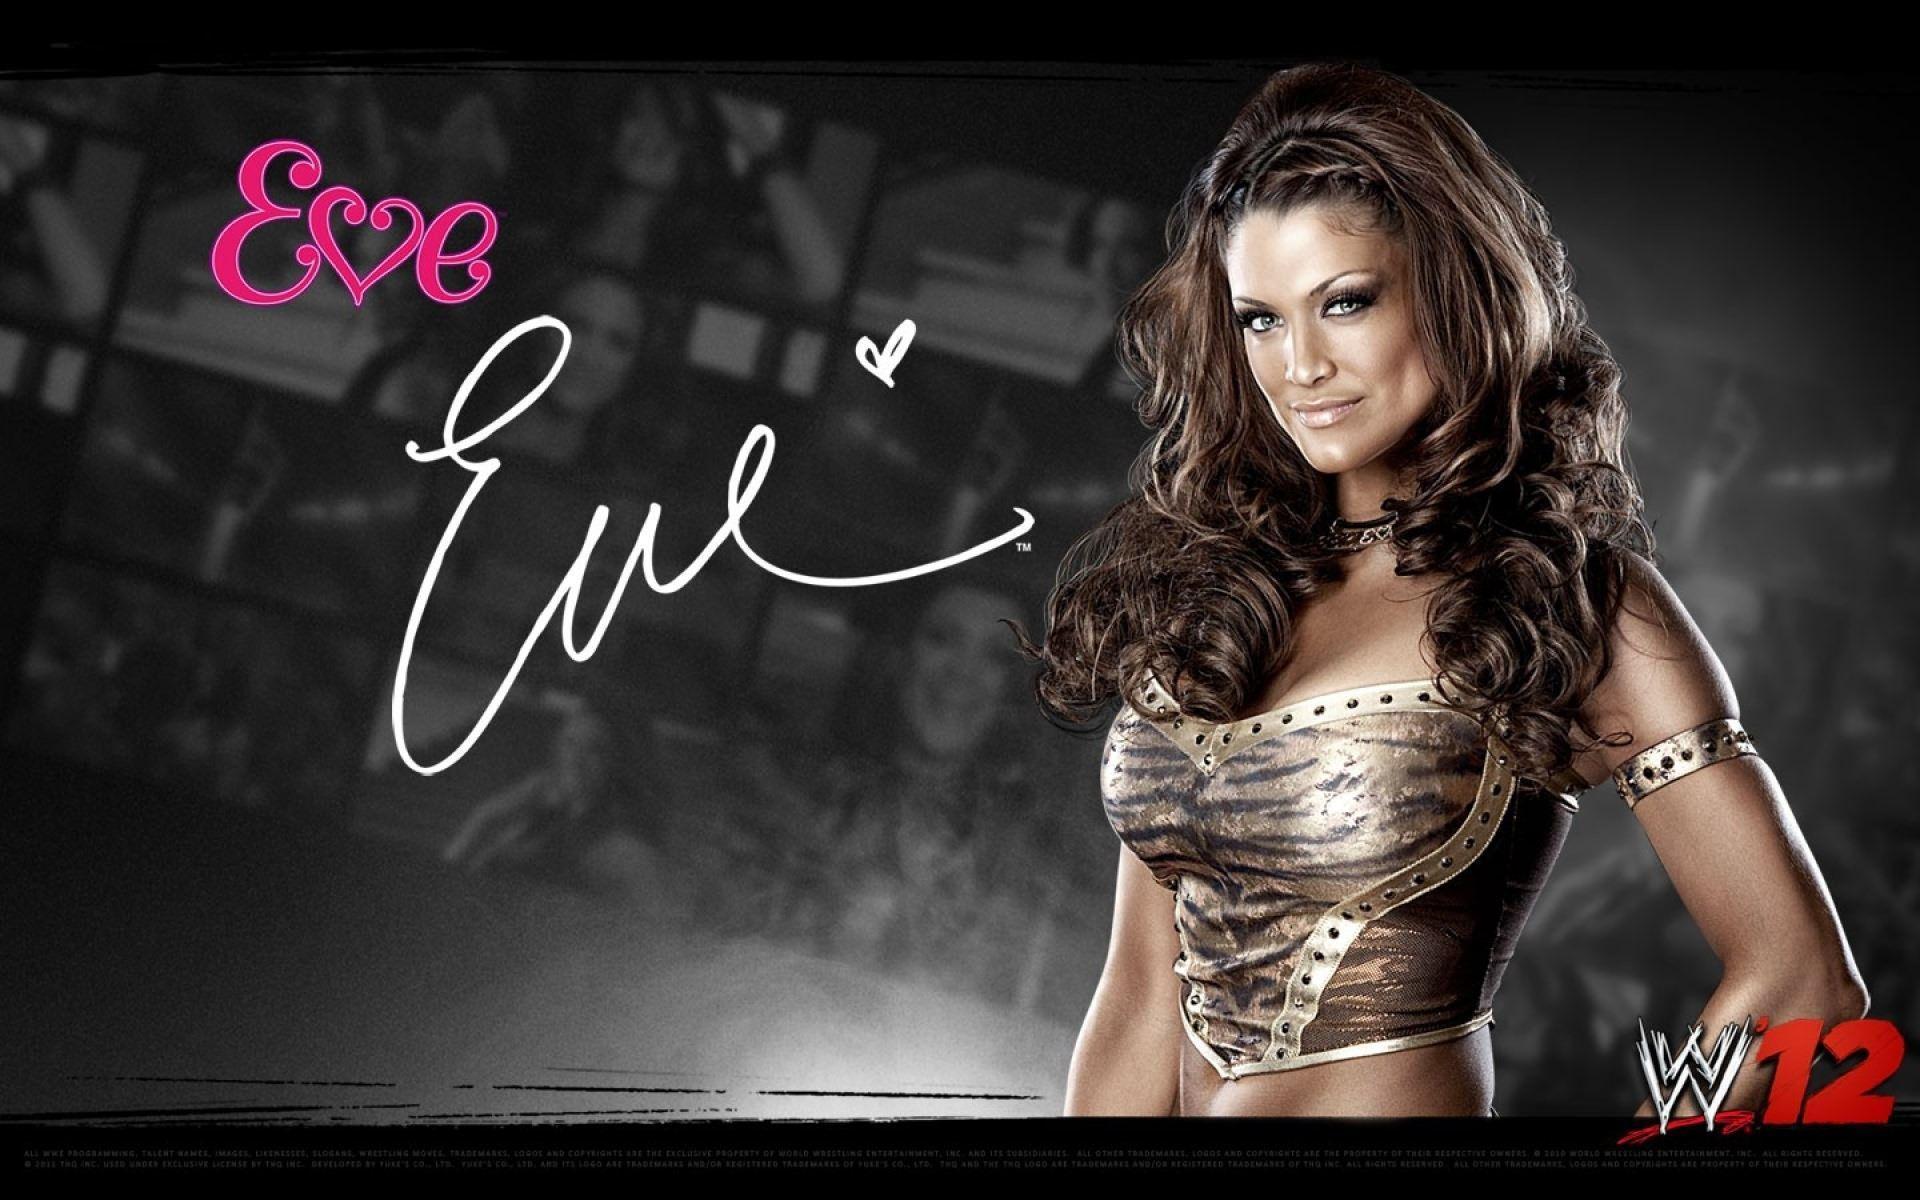 WWE Woman Wallpapers